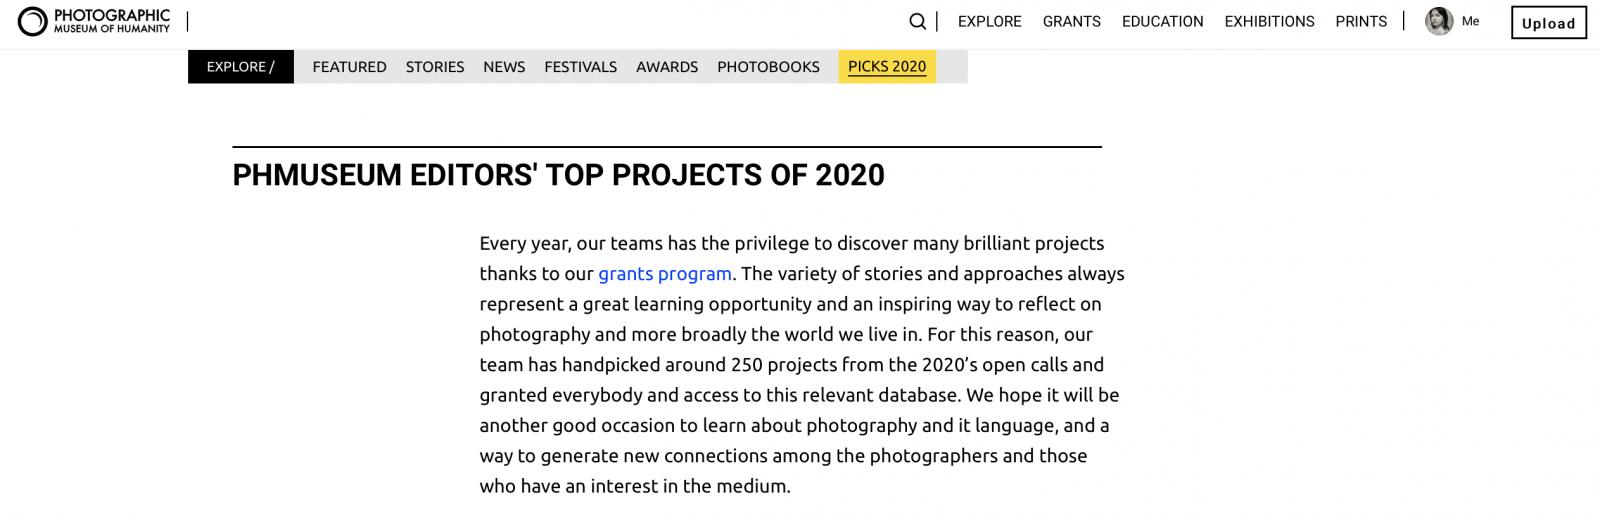 Photography image - Loading Screen_Shot_2020-12-17_at_7.49.26_PM.png